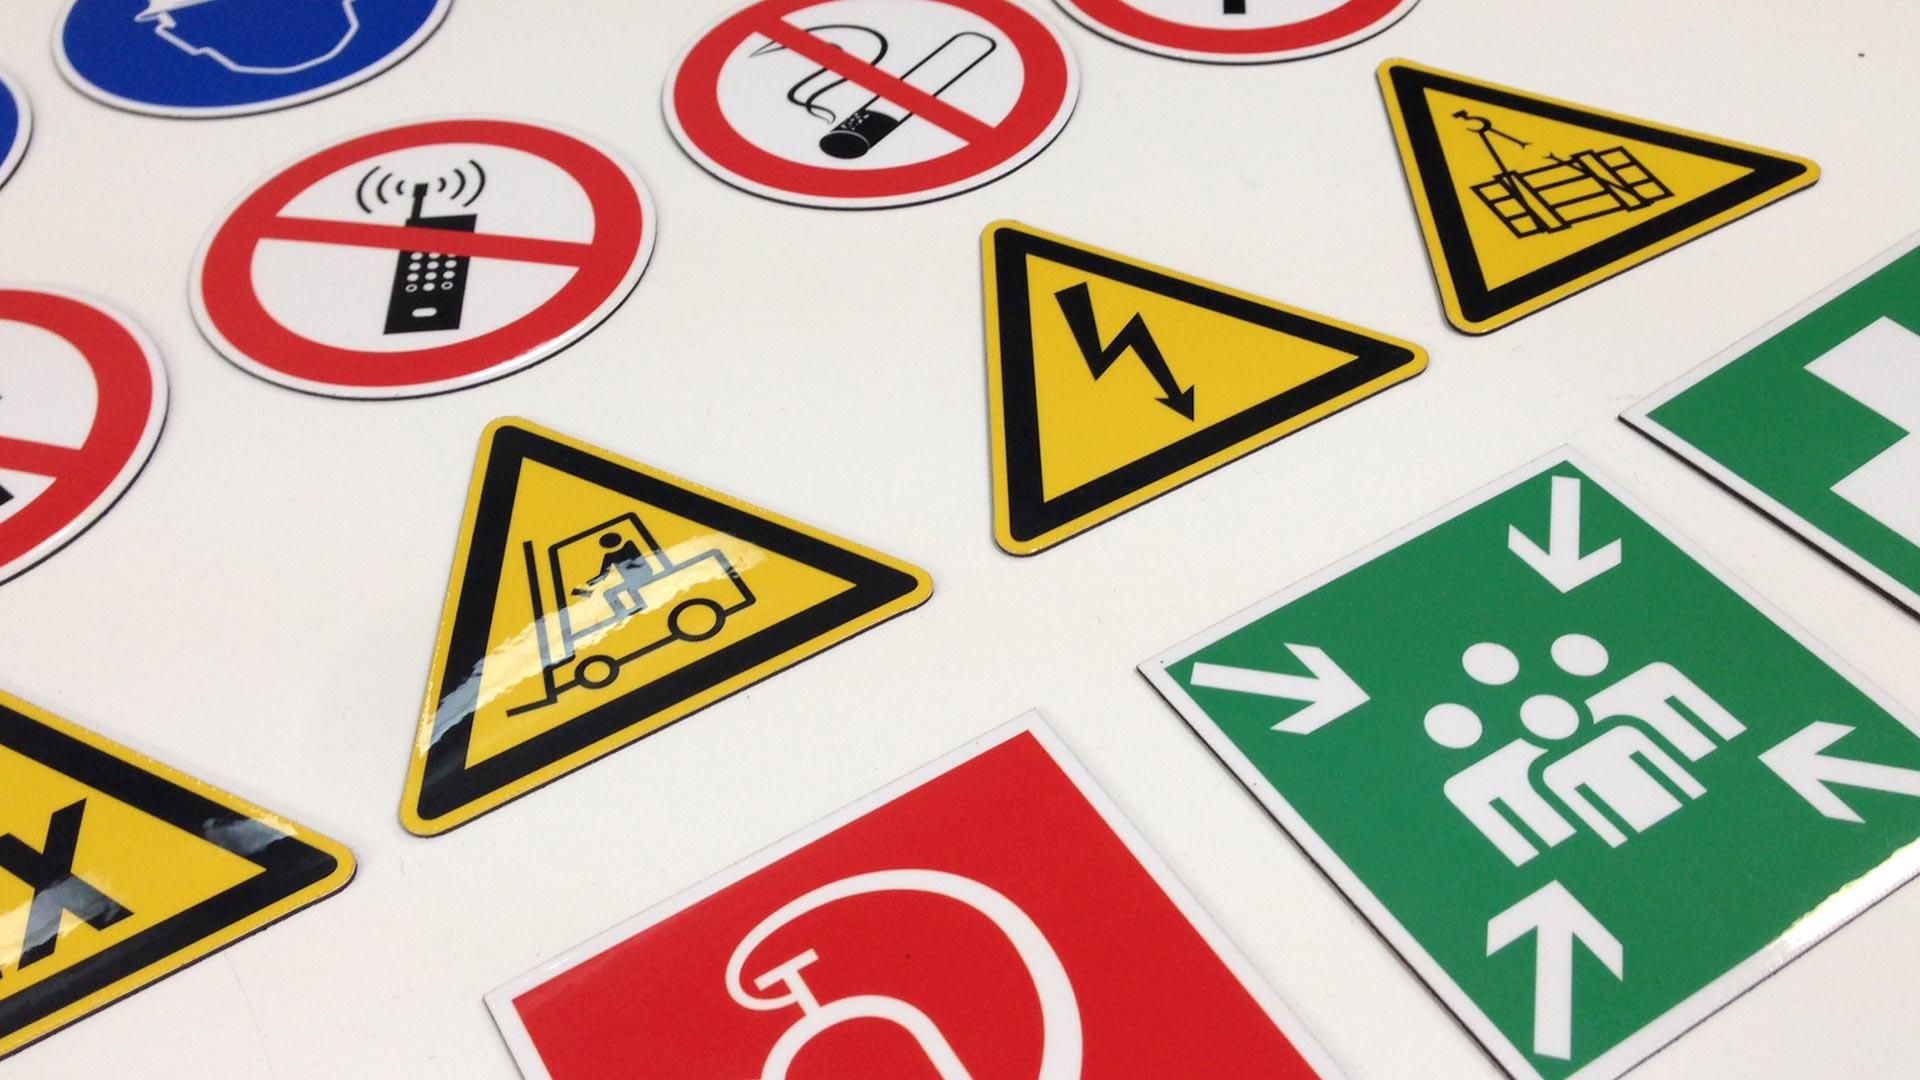 magnet-infos-dangers-signaletique-03